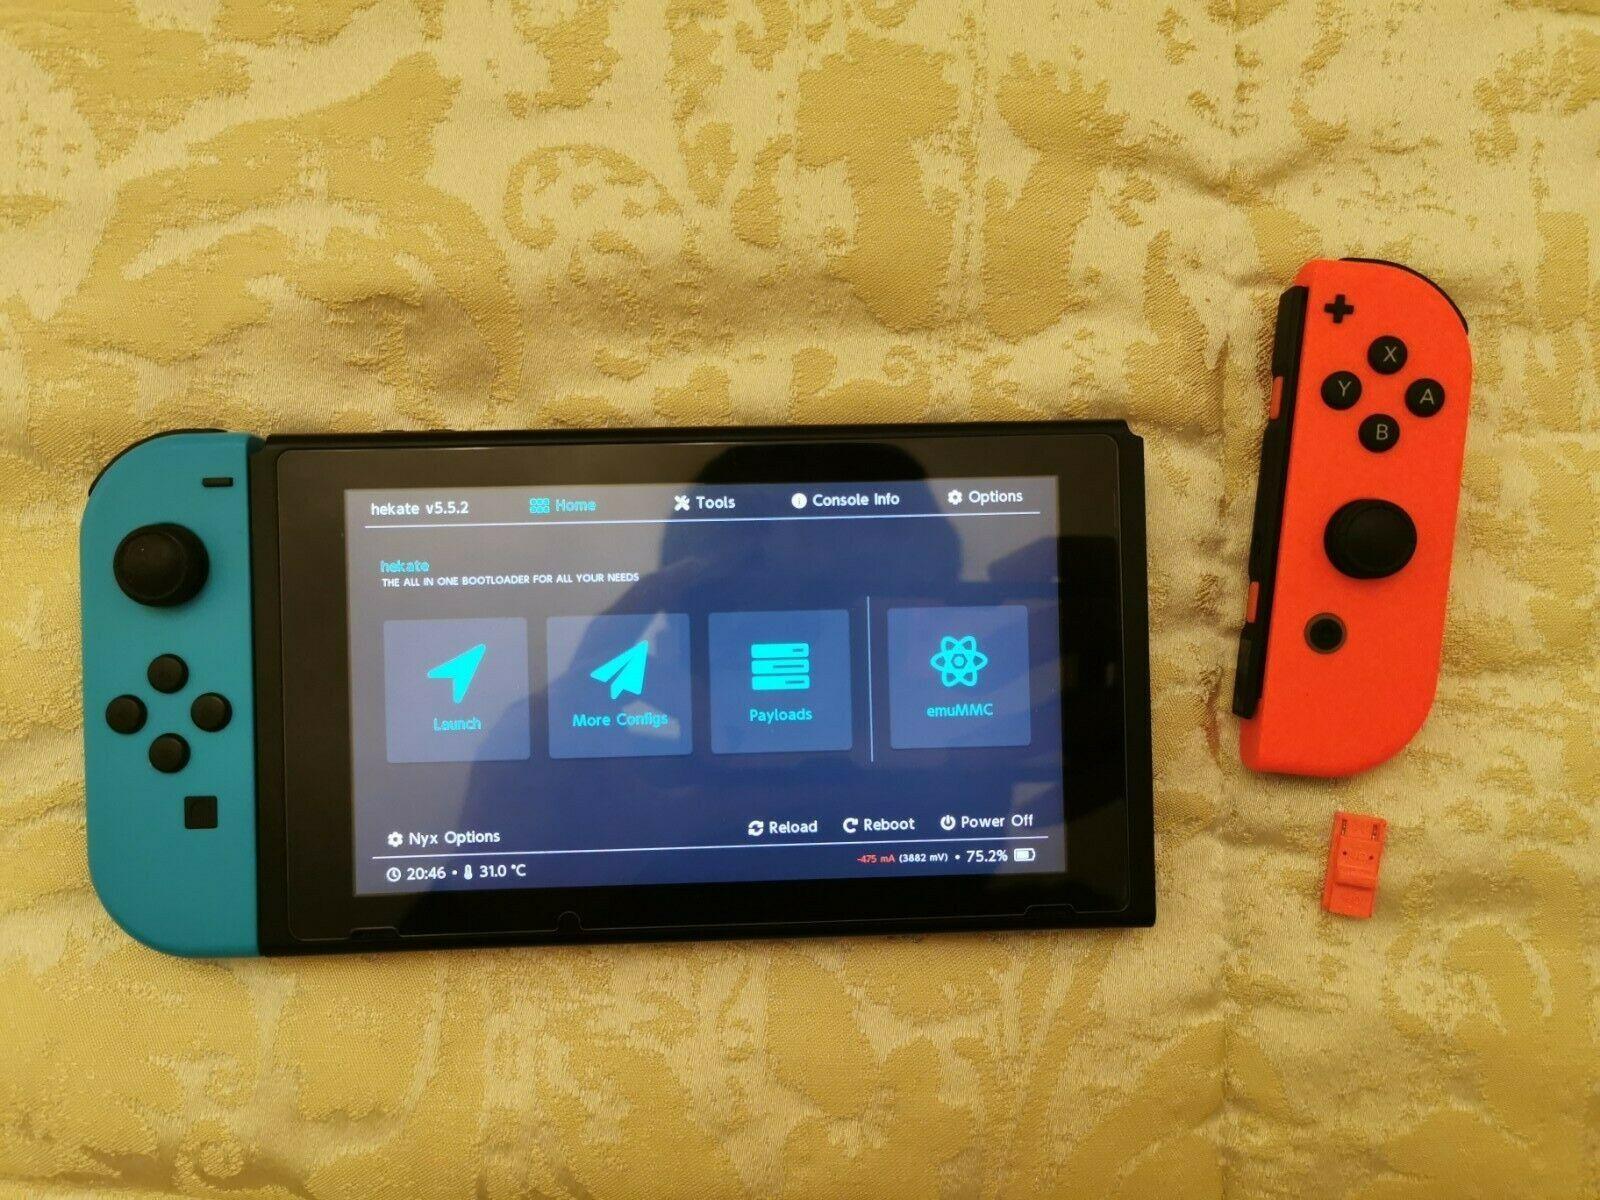 CFW dla konsol PS3-4, Nintendo switch rev1, ps vita, psp